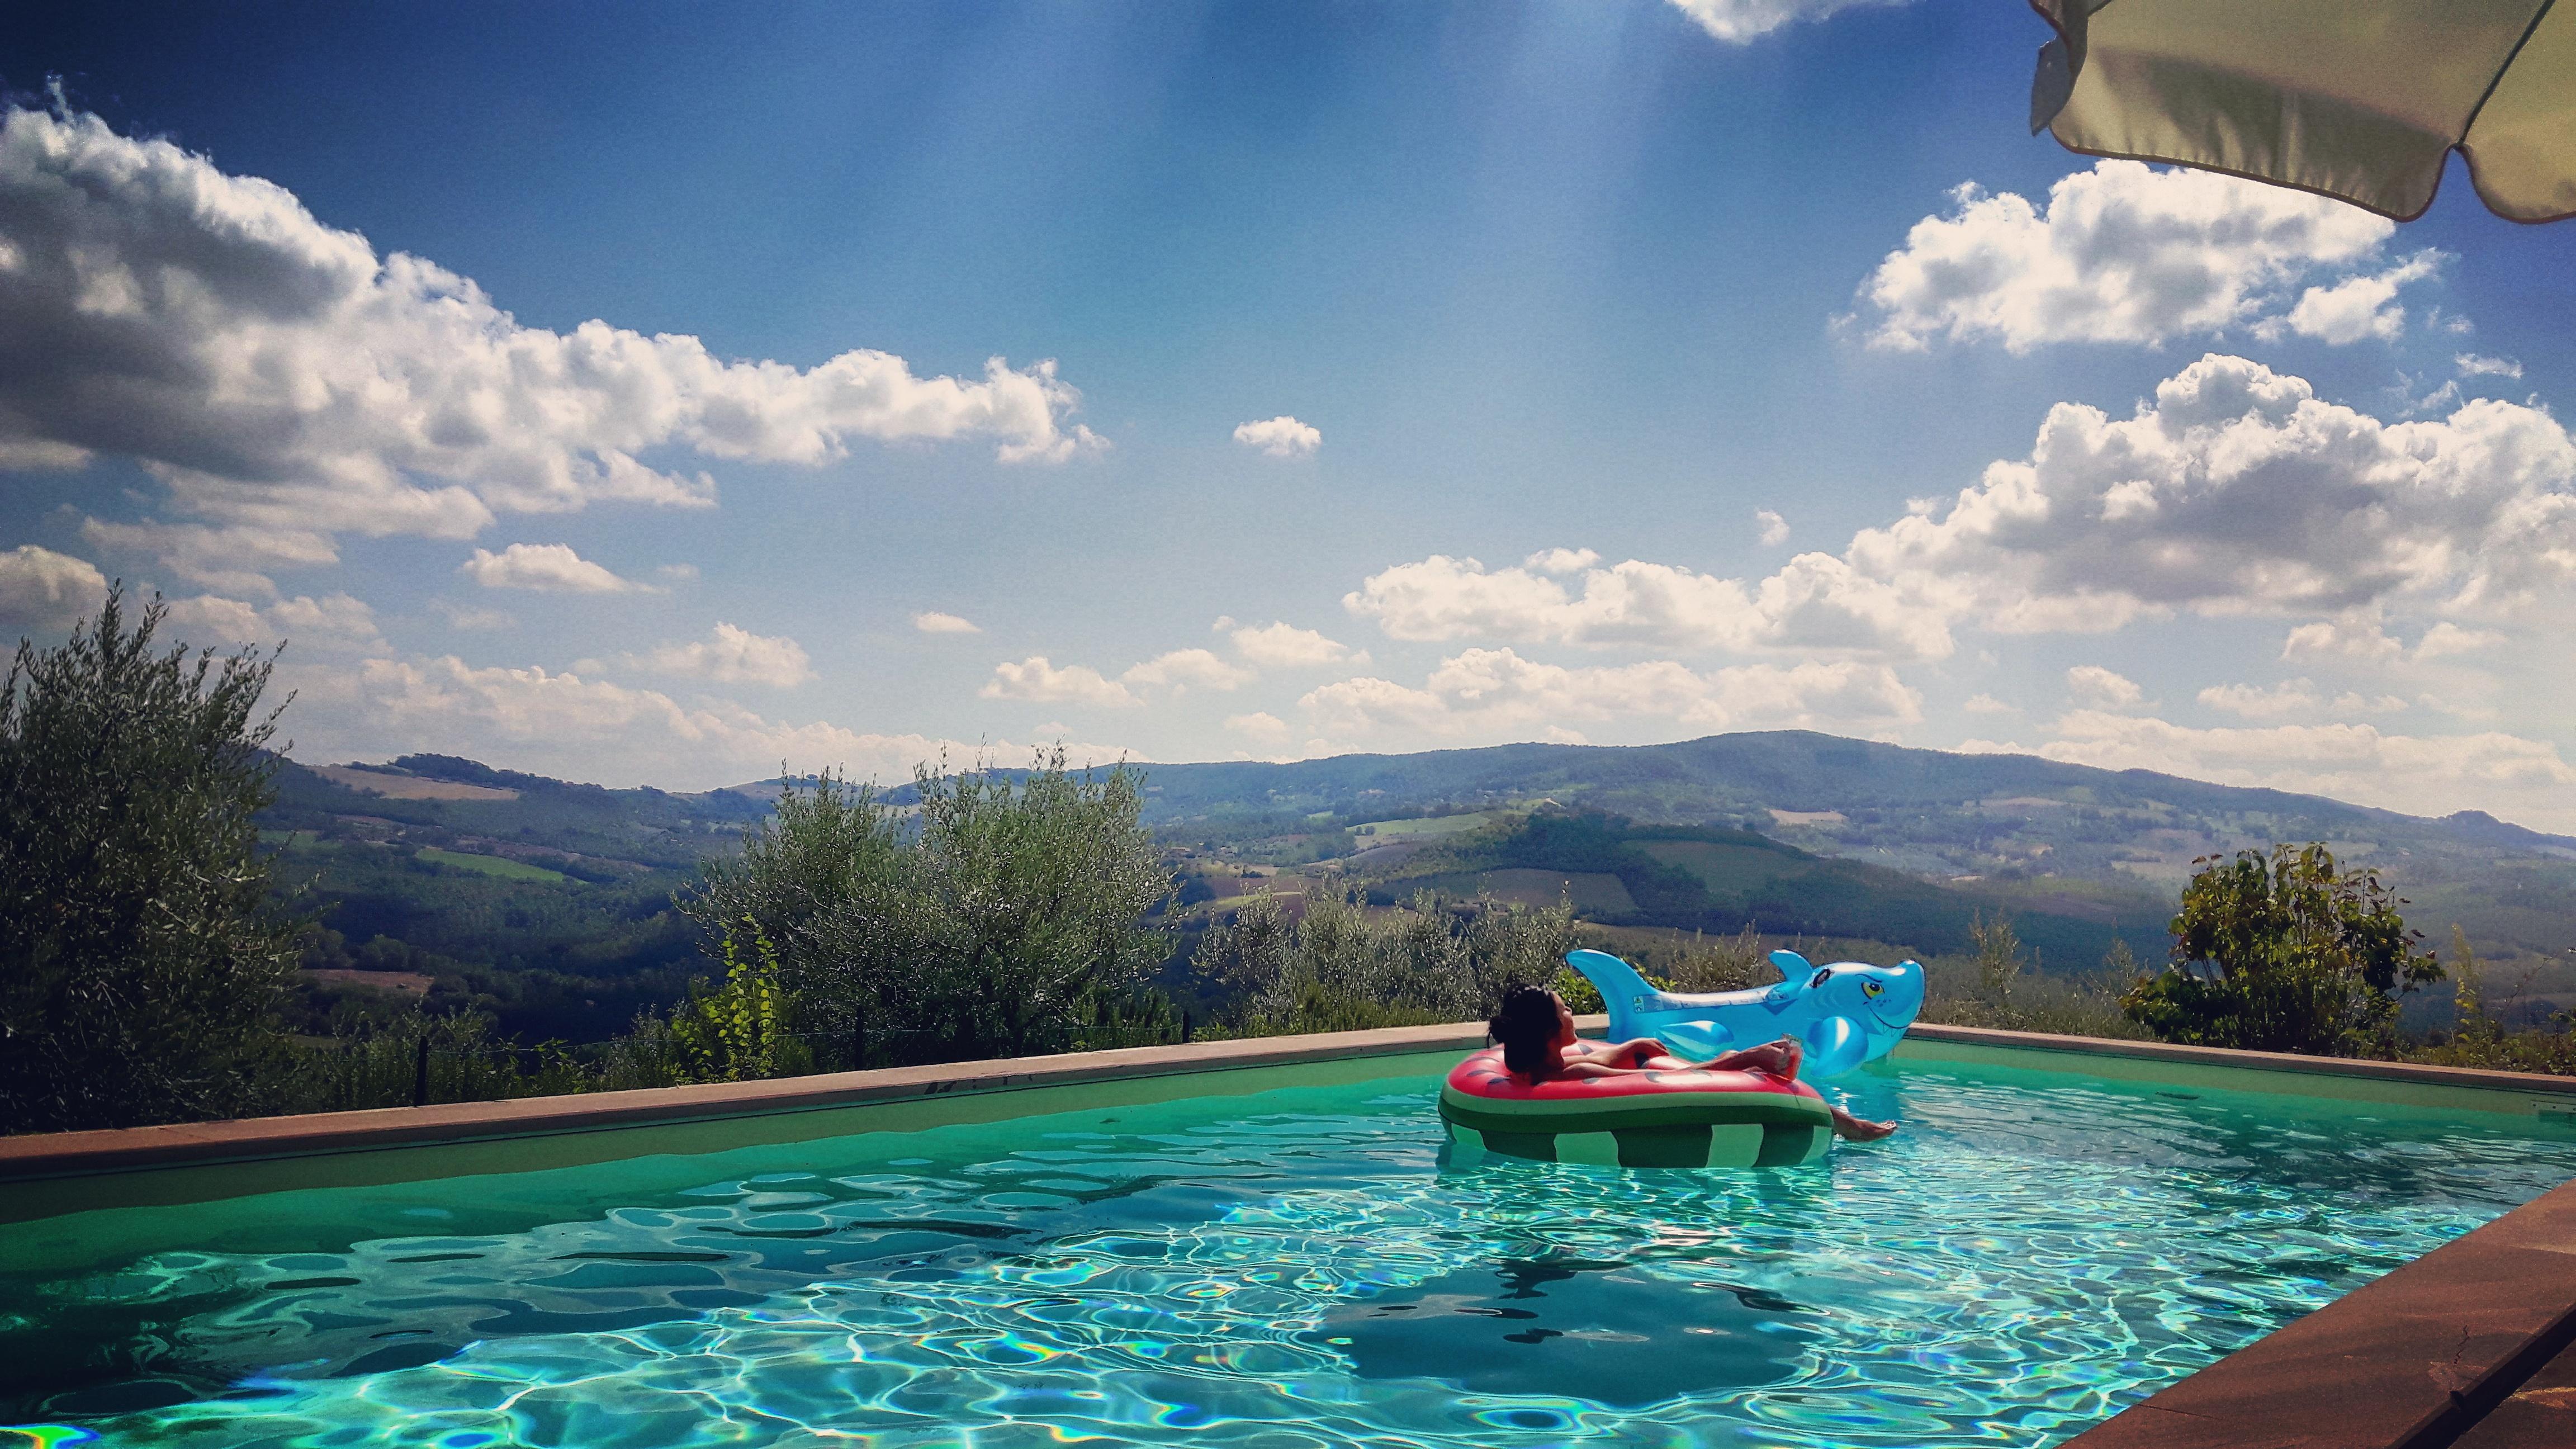 Pool overlooking the hills